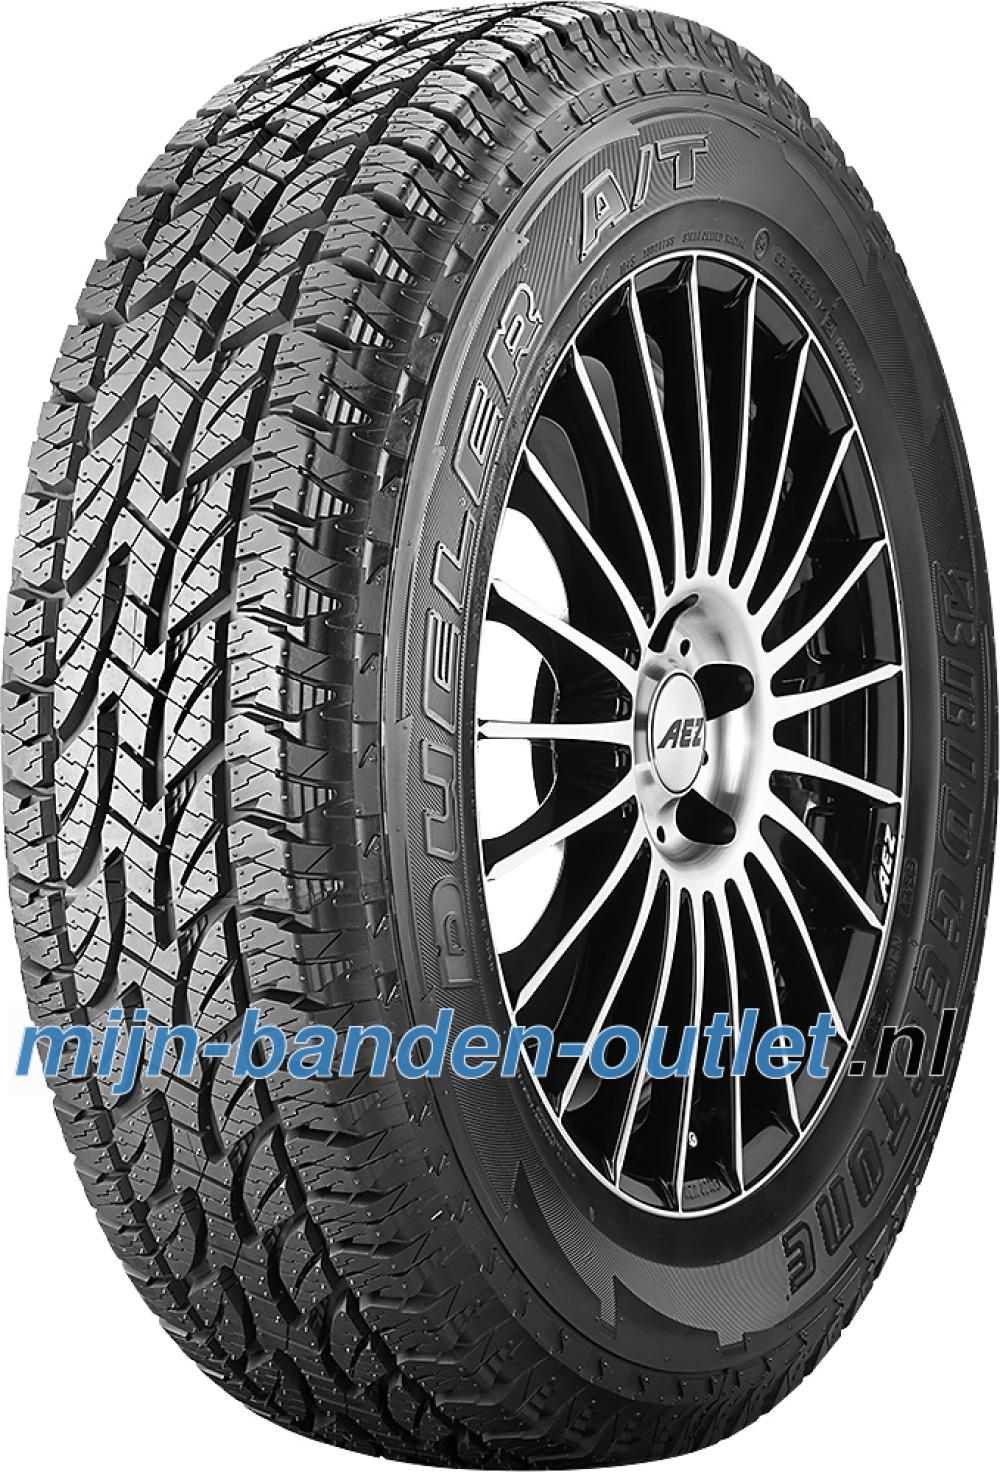 Bridgestone Dueler A/T 694 ( 265/65 R17 112T RBT )